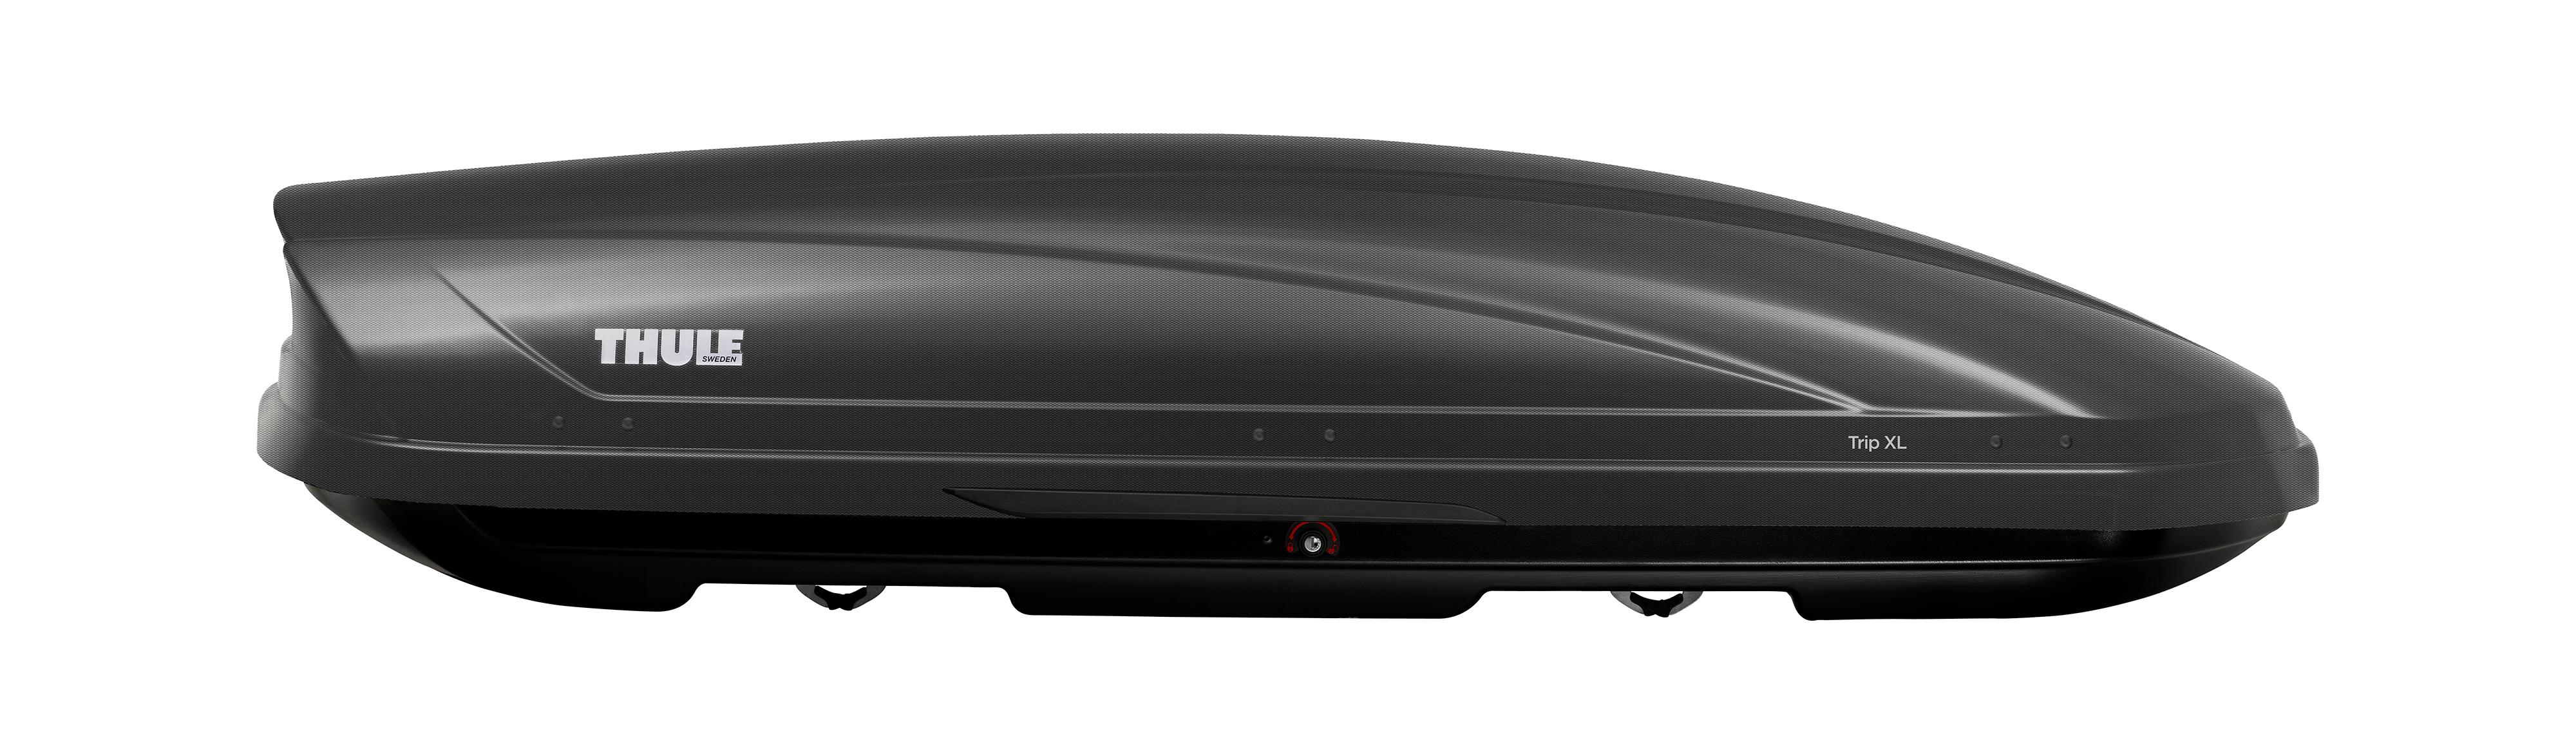 thule 620814 trip xl auto. Black Bedroom Furniture Sets. Home Design Ideas